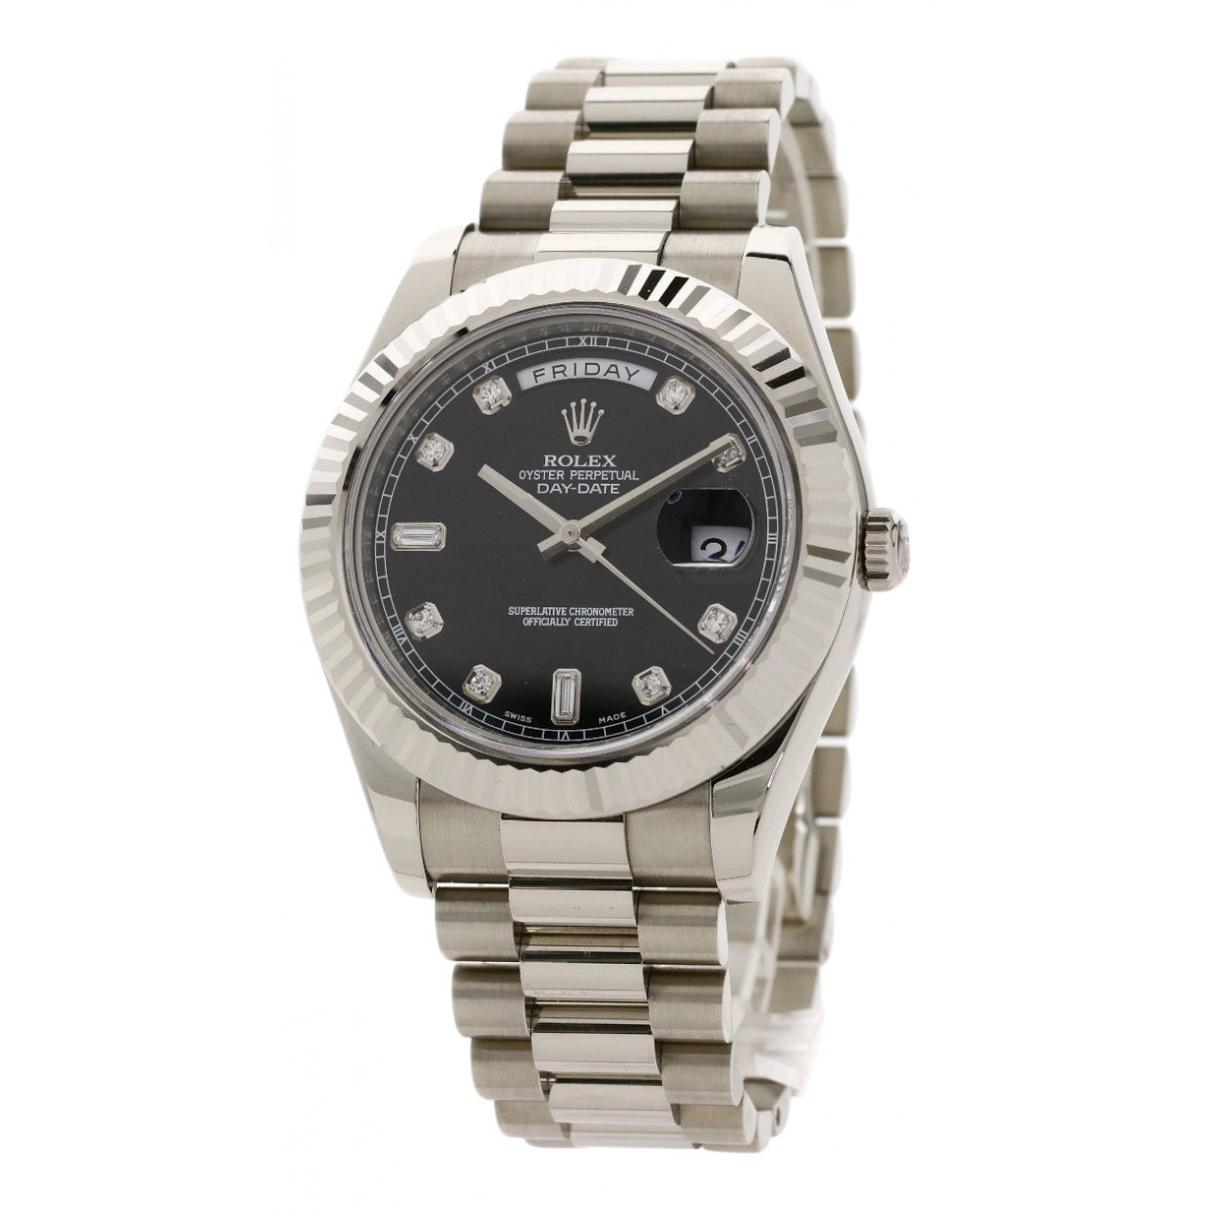 Relojes Day-Date II 40mm Rolex